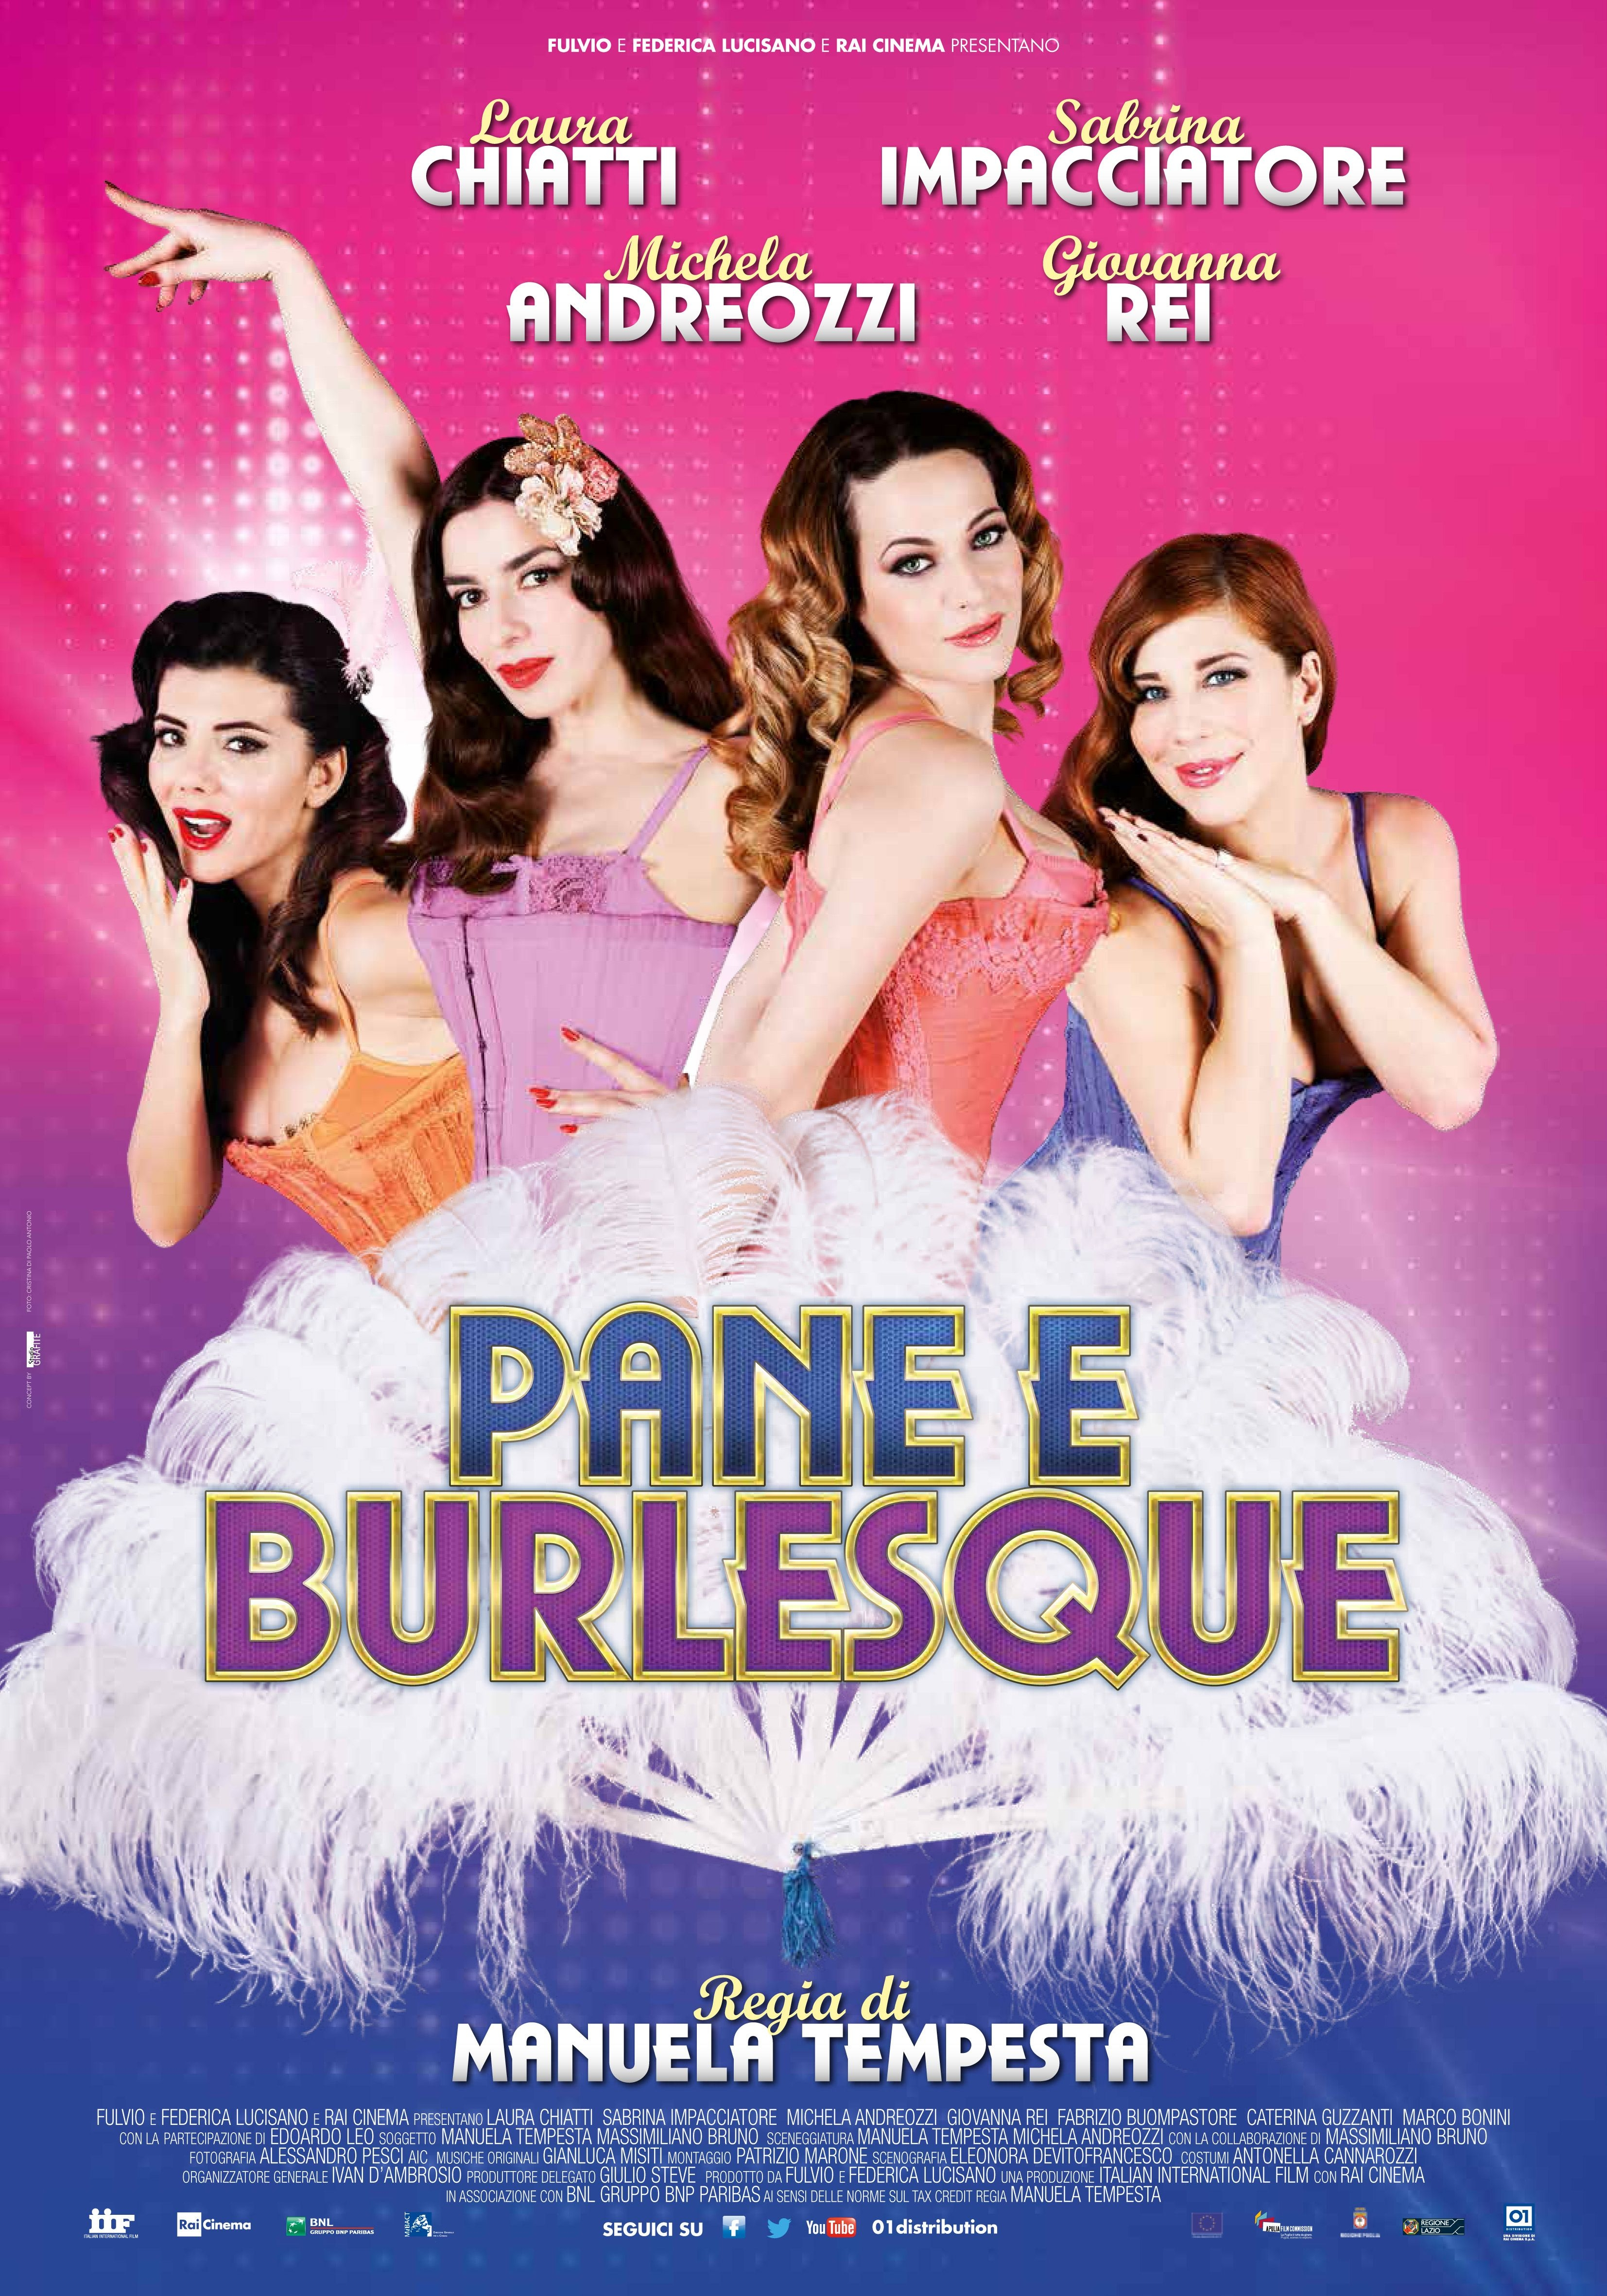 Pane e burlesque: la locandina italiana